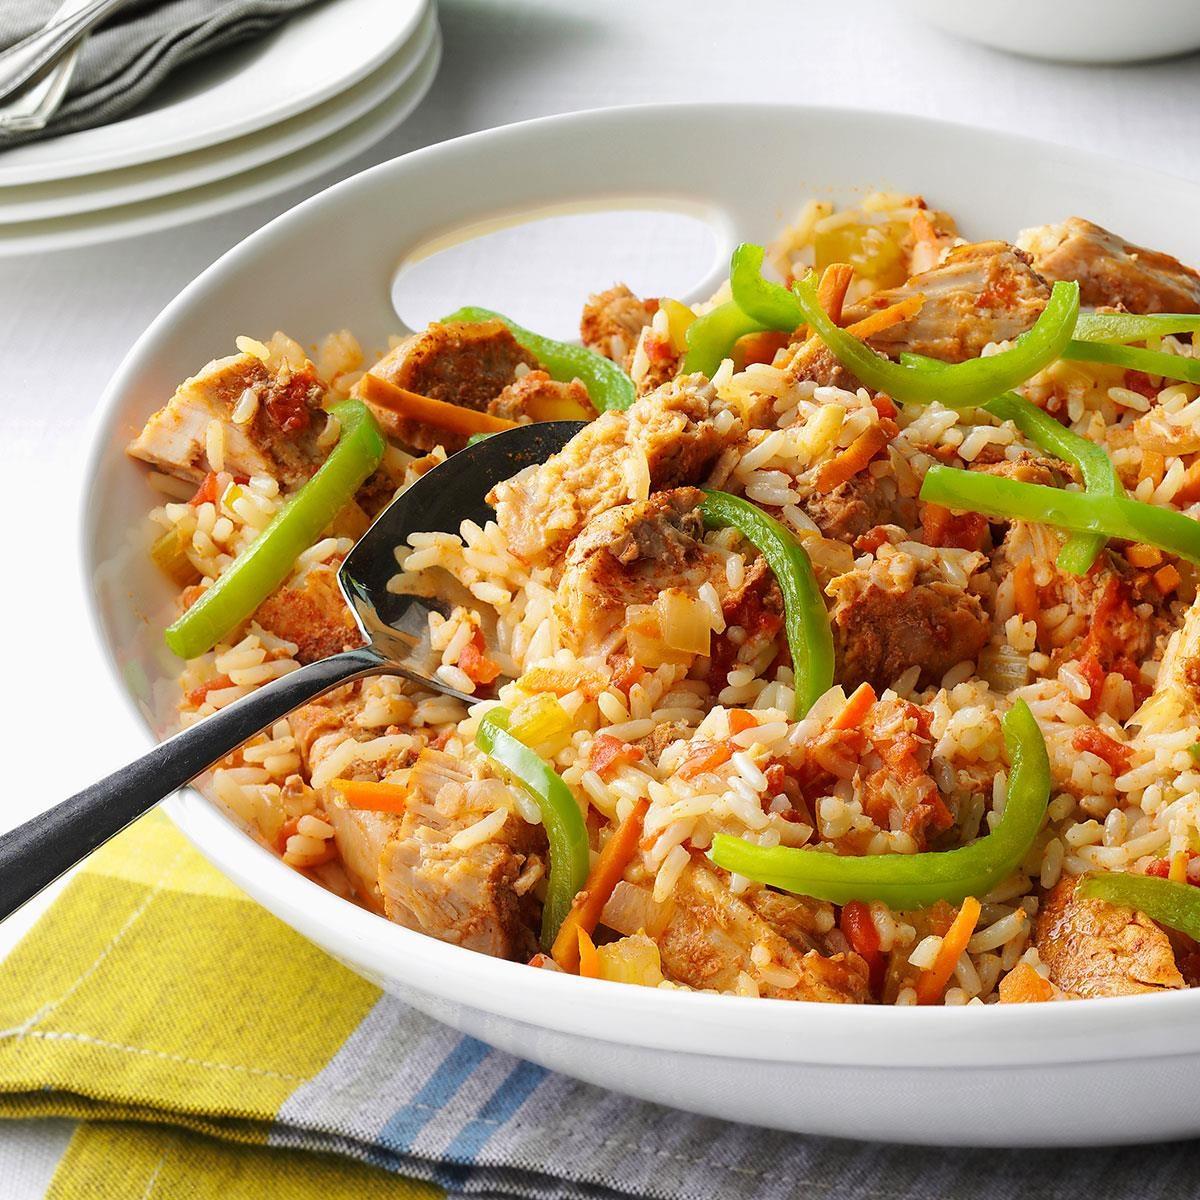 Day 14: Cajun Pork and Rice